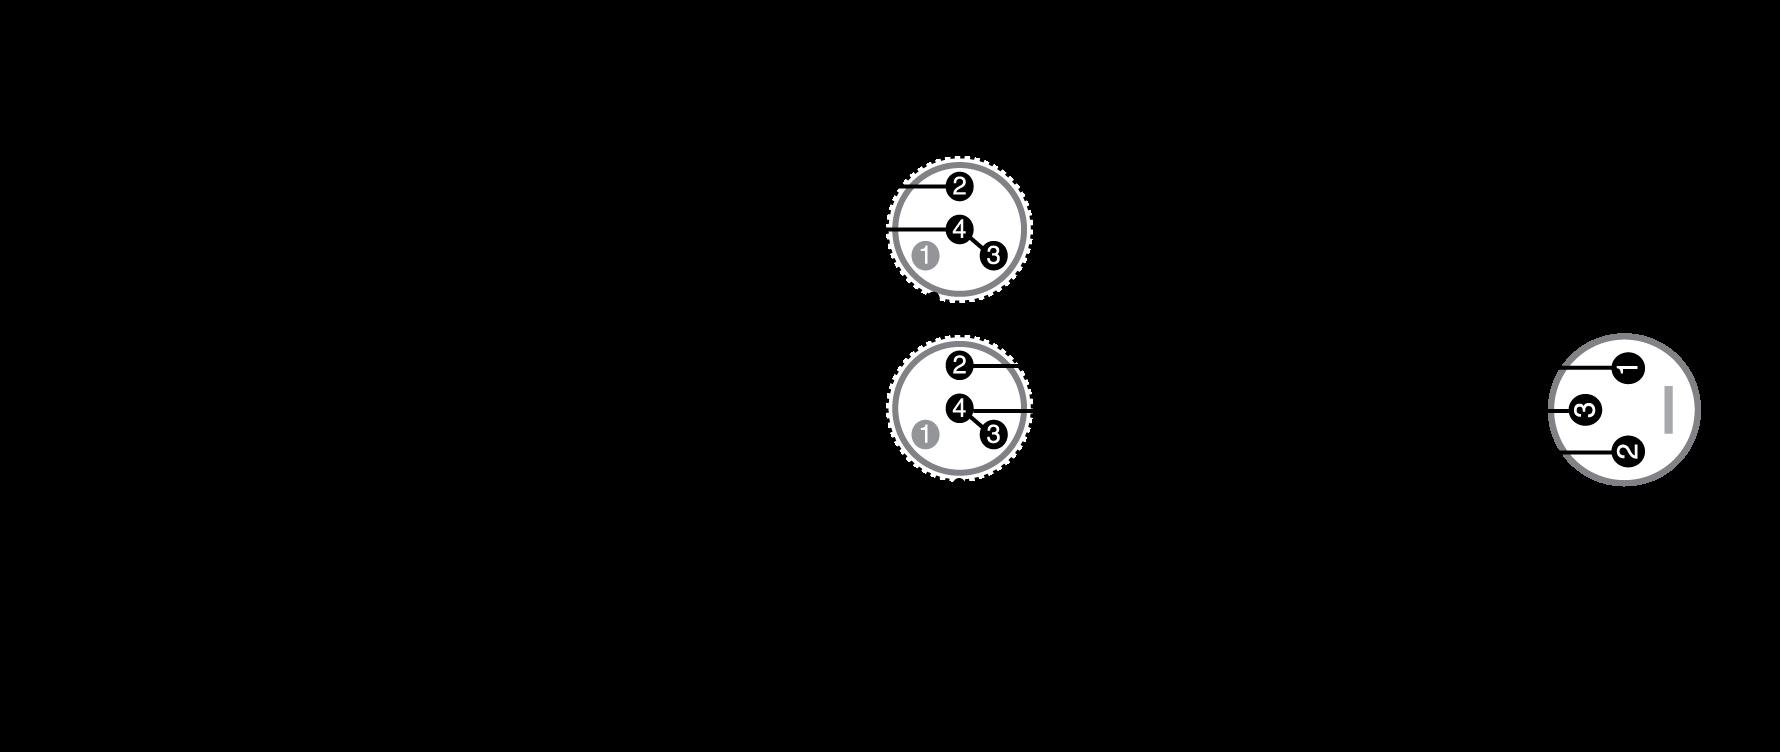 Mini 4 Pin Xlr Wiring Diagram - Wiring Diagram